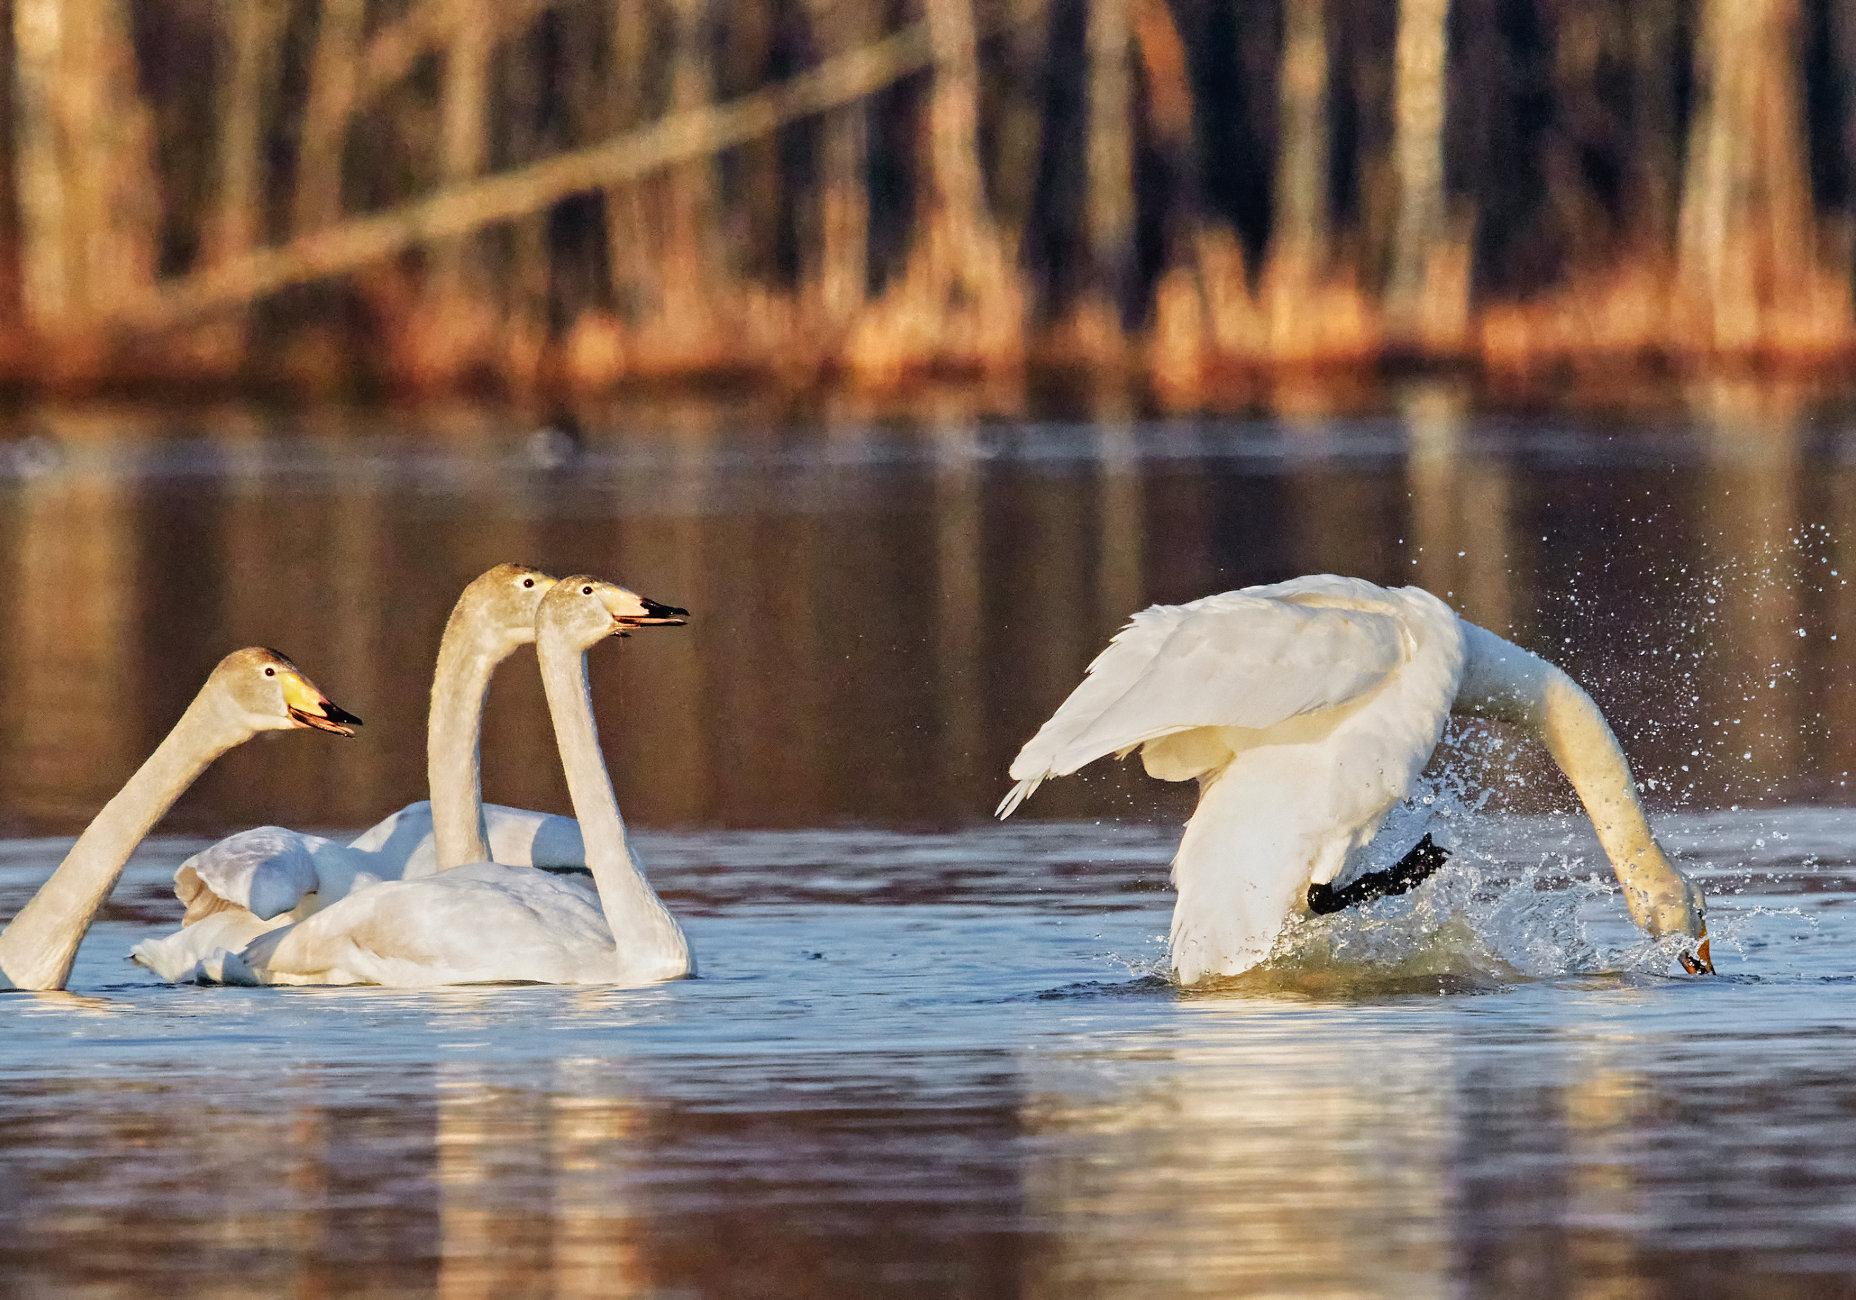 Whooper swan  in action